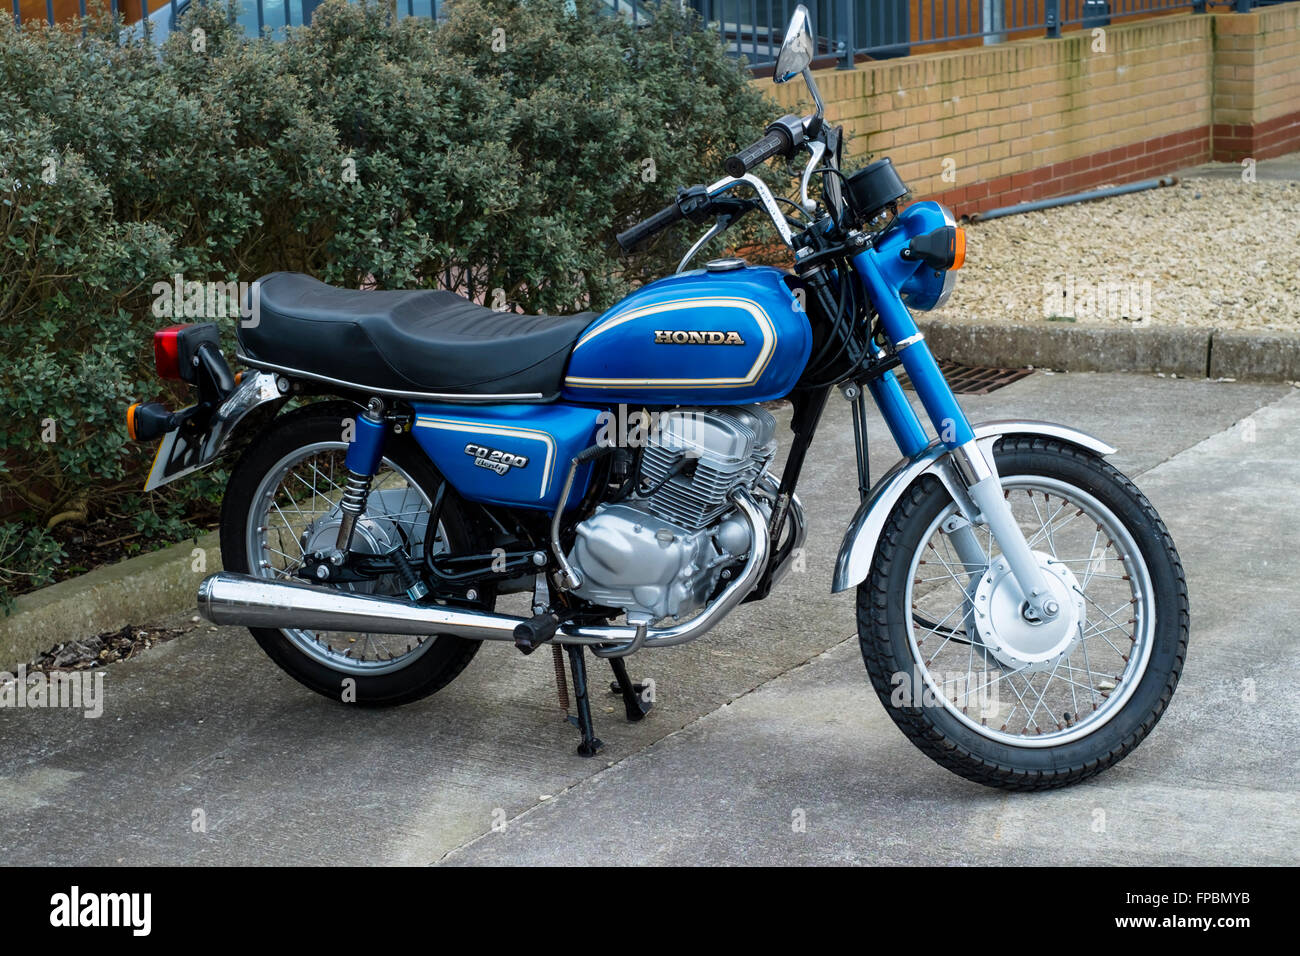 The classic honda cd200 benly motor bike stock photo for Honda motor company stock